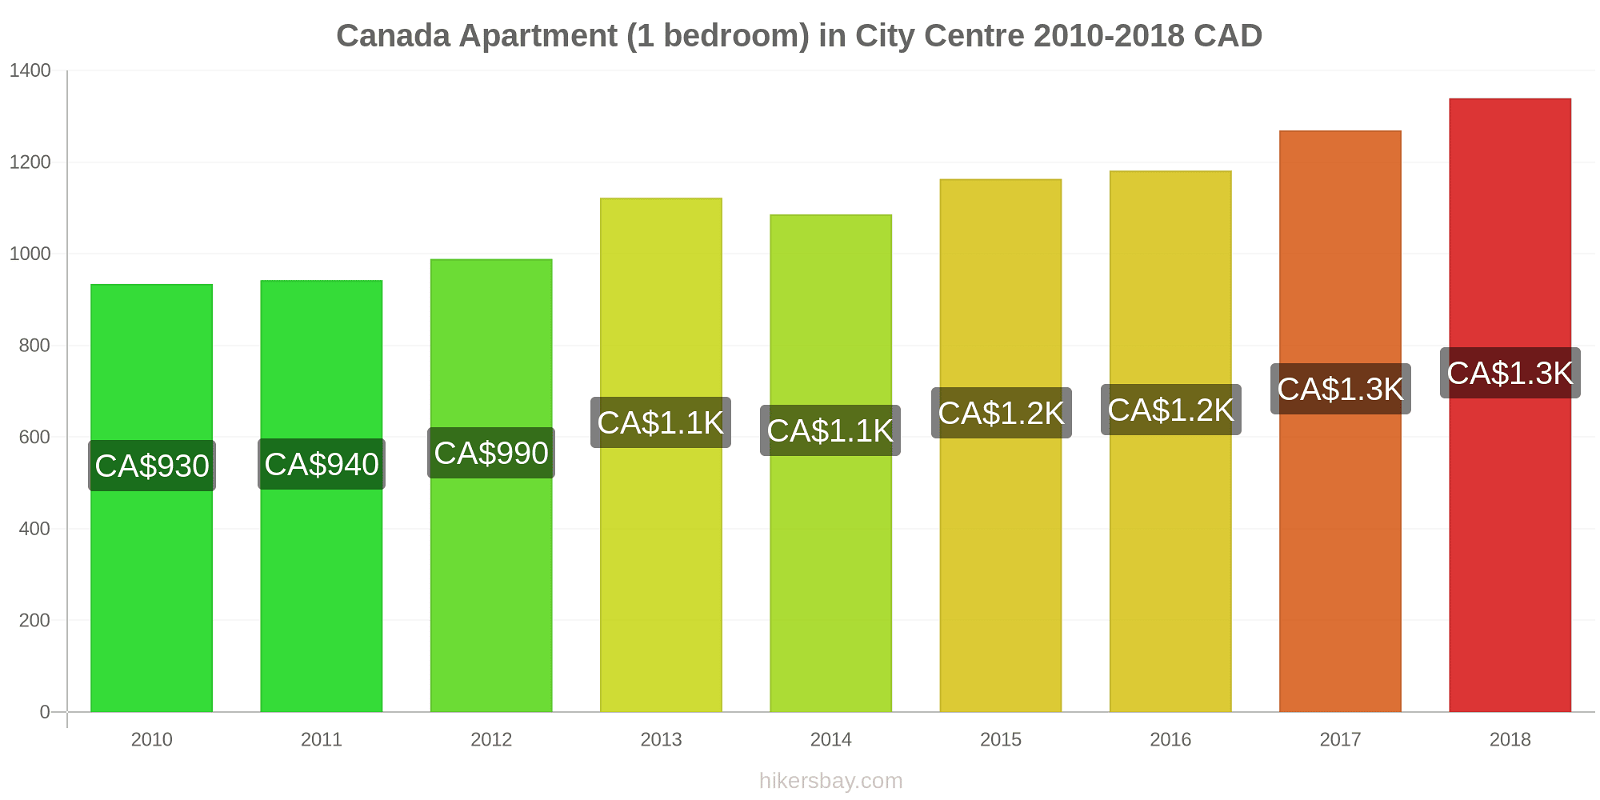 Canada price changes Apartment (1 bedroom) in City Centre hikersbay.com